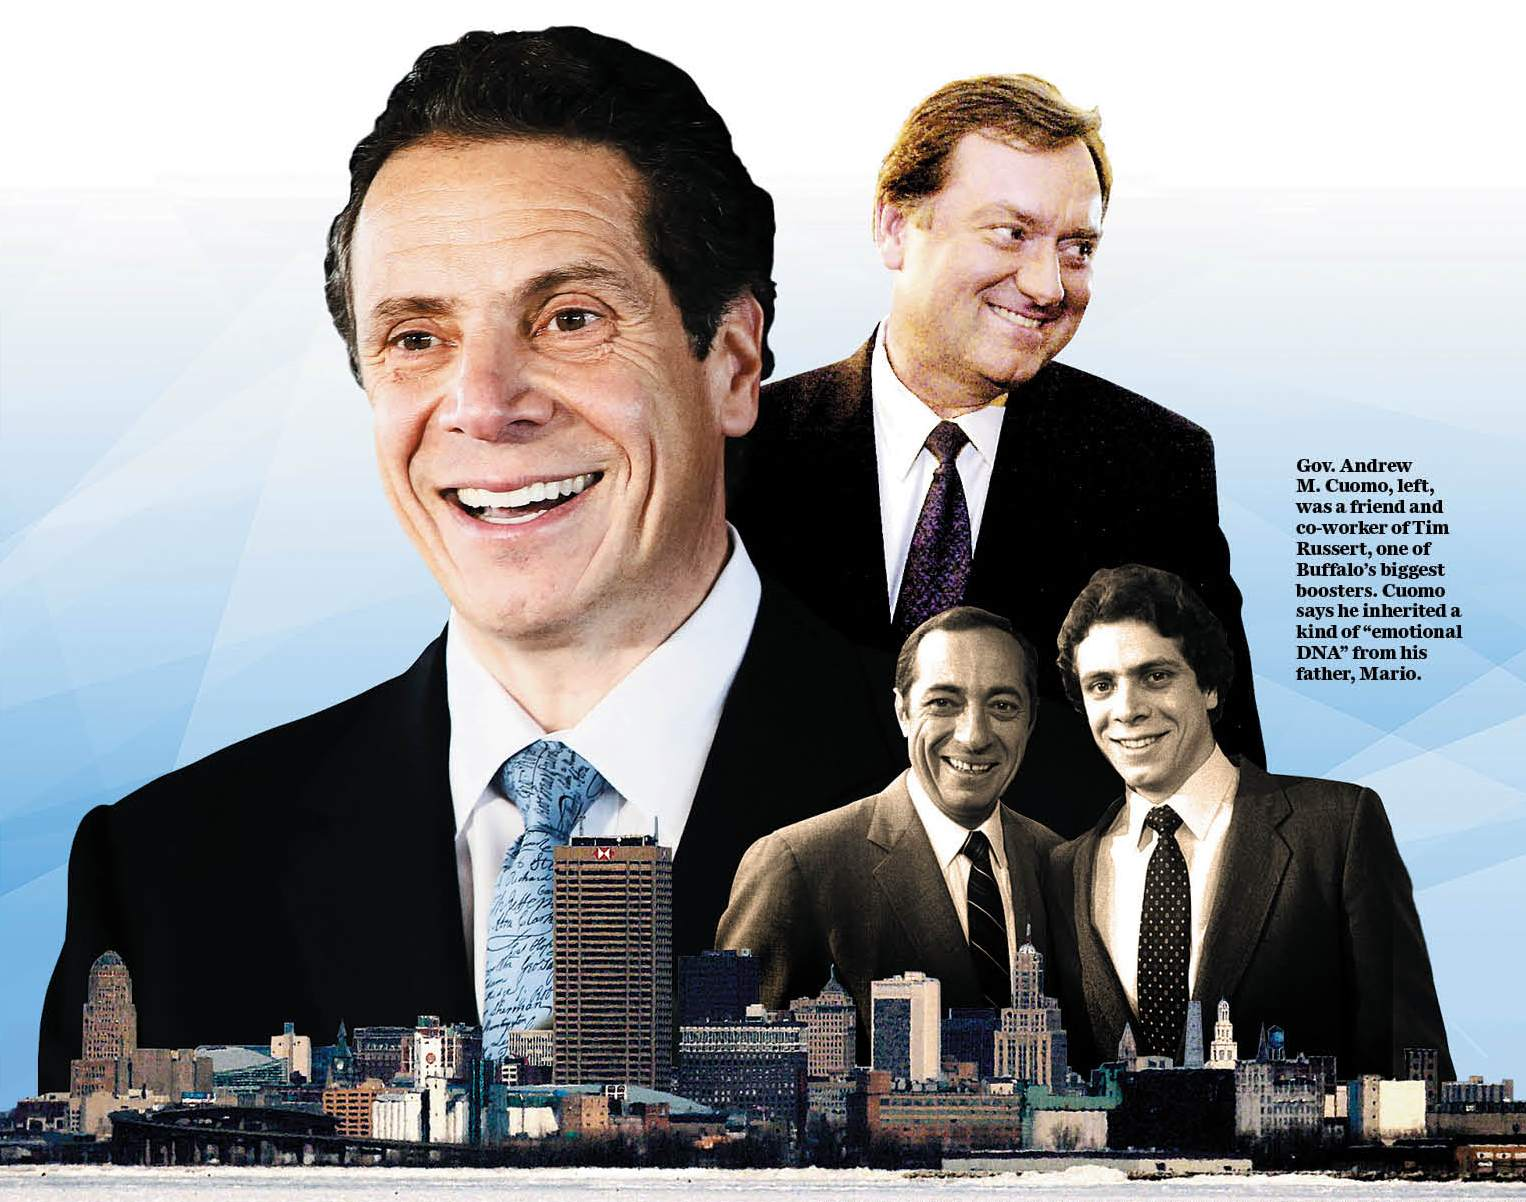 Photos by Derek Gee/Buffalo News; New York Times file photo of Mario Cuomo; Buffalo News photo illustration.